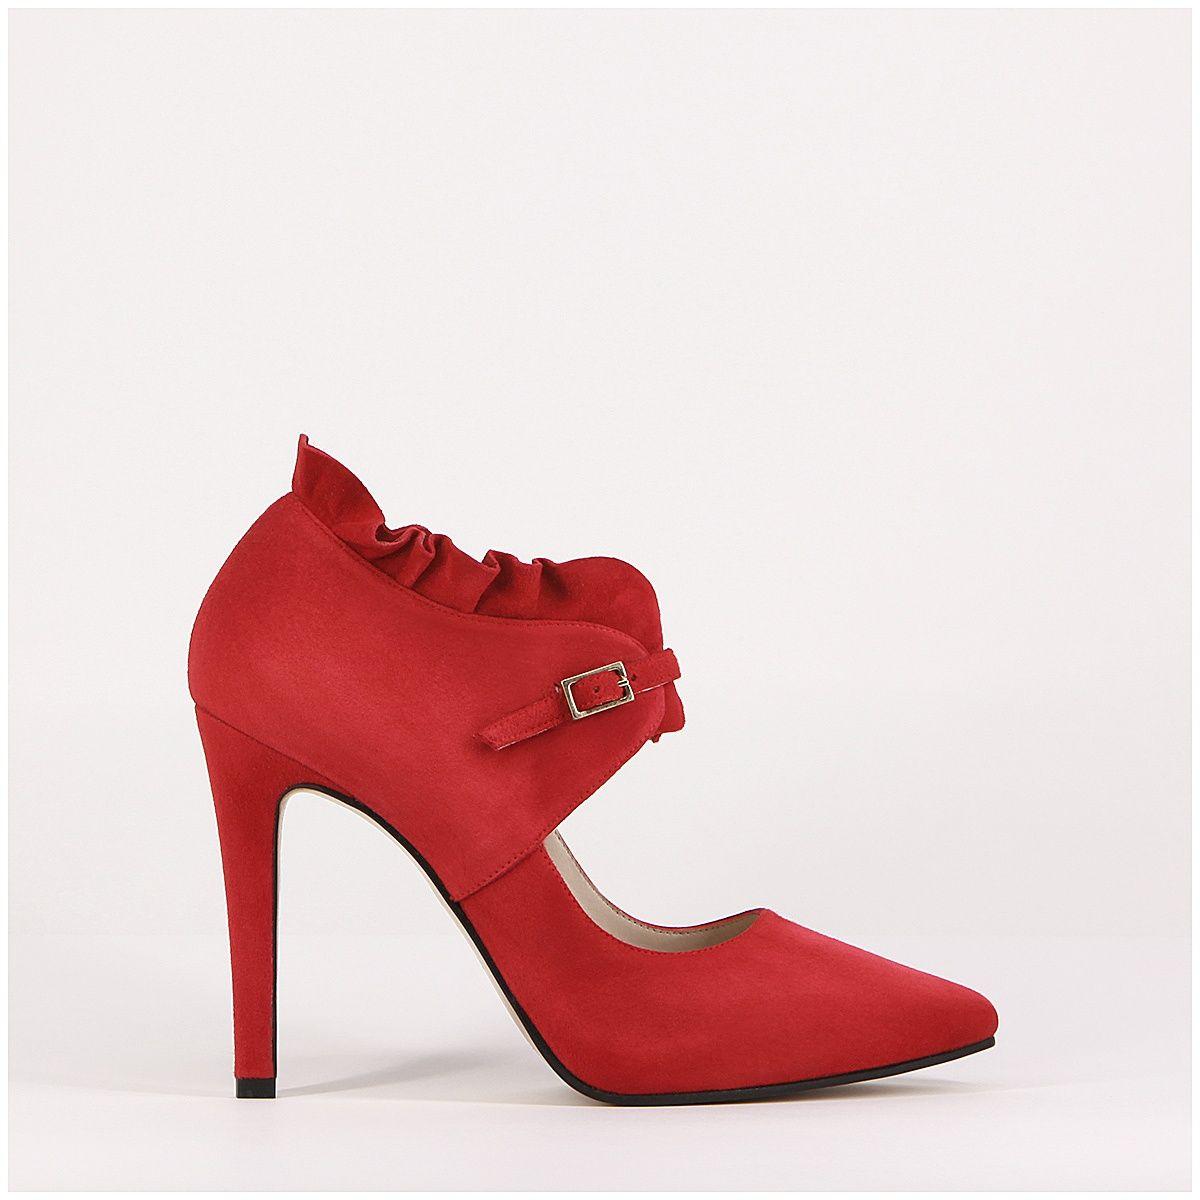 3ccf66a2 Zapato de salón con volantes en rojo Sabia | LODI | Zapatos ...